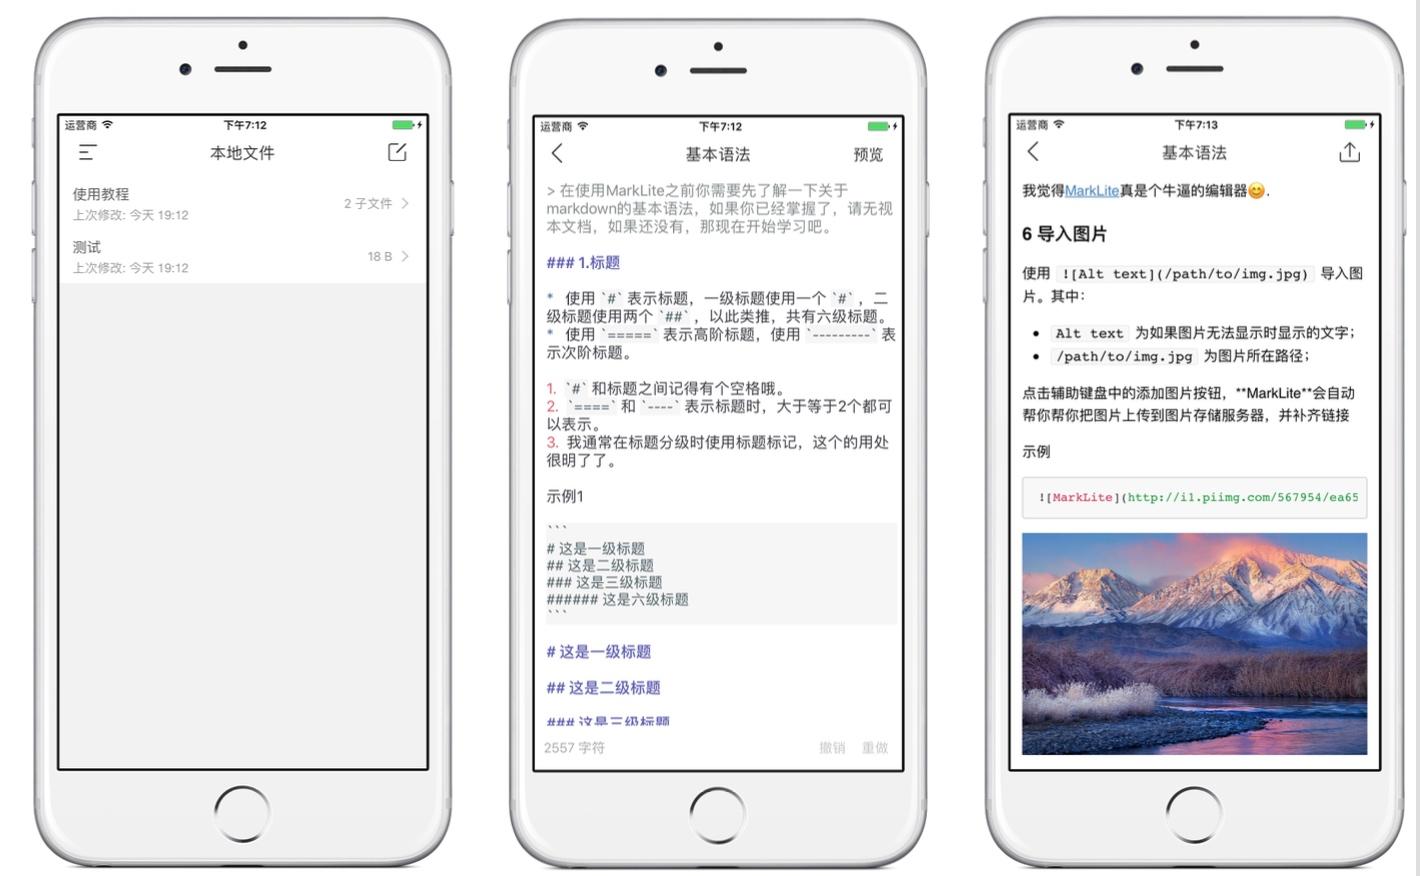 iPhone_ScreenShot.jpg